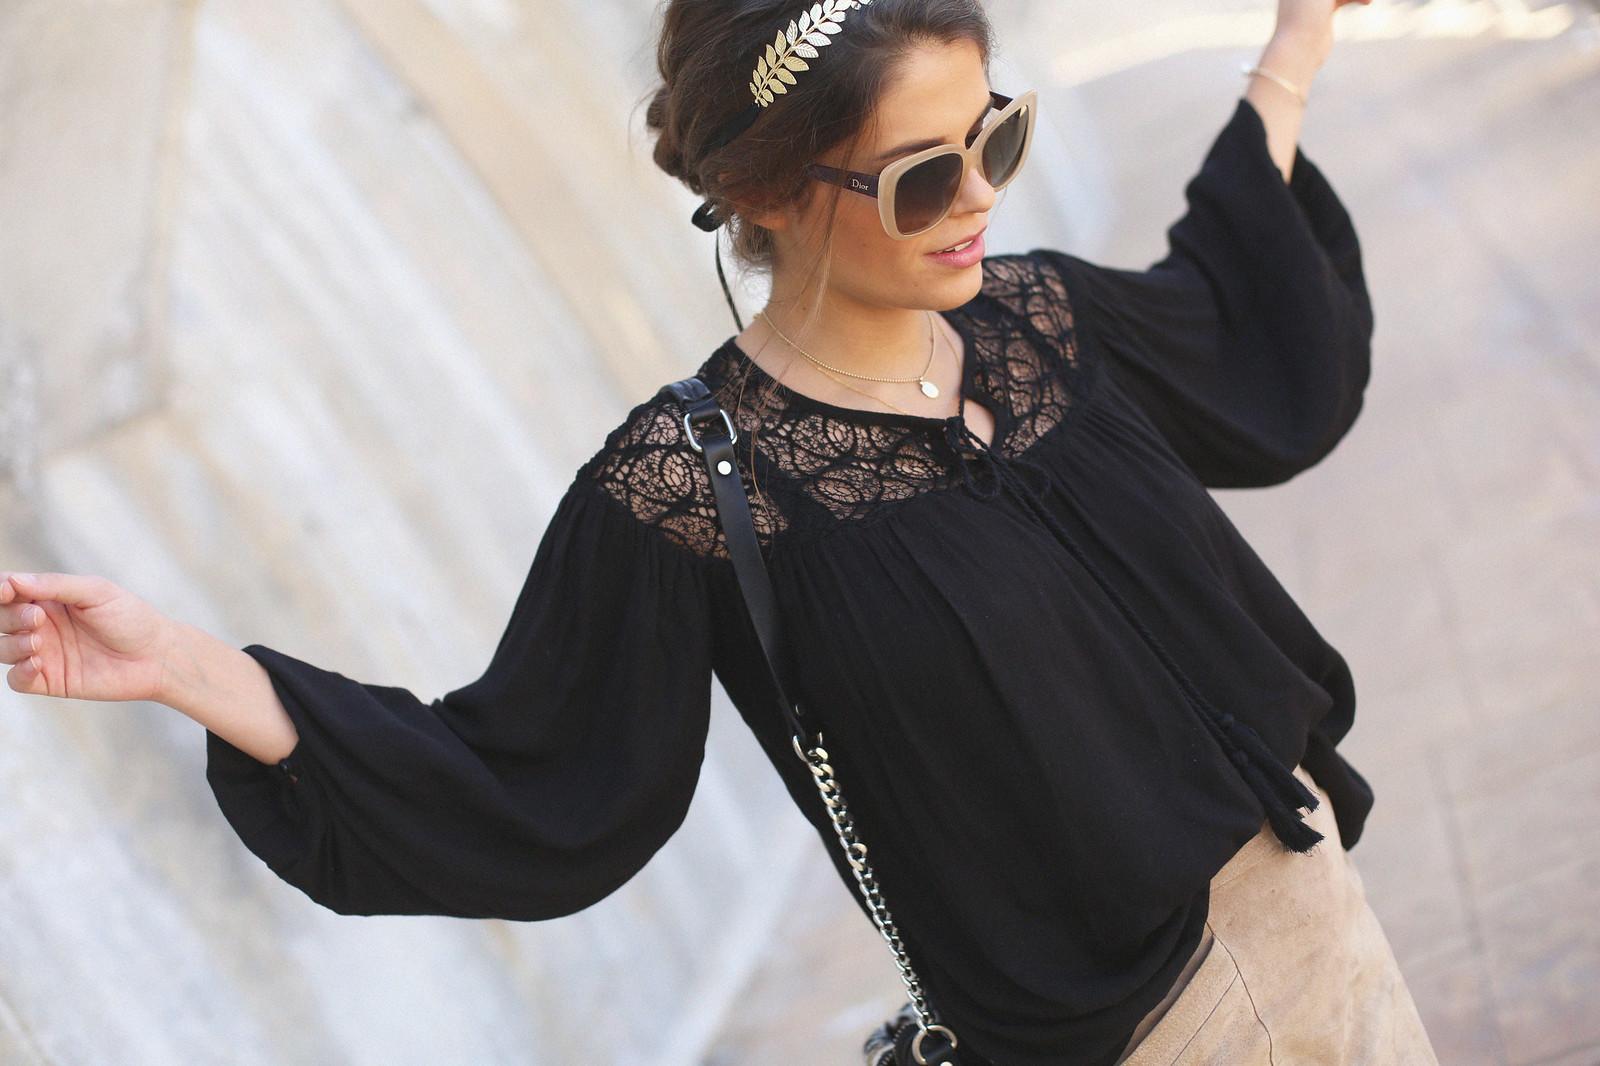 C.black boho top camel suede skirt gladiator sandals golden headband seams for a desire jessie chanes